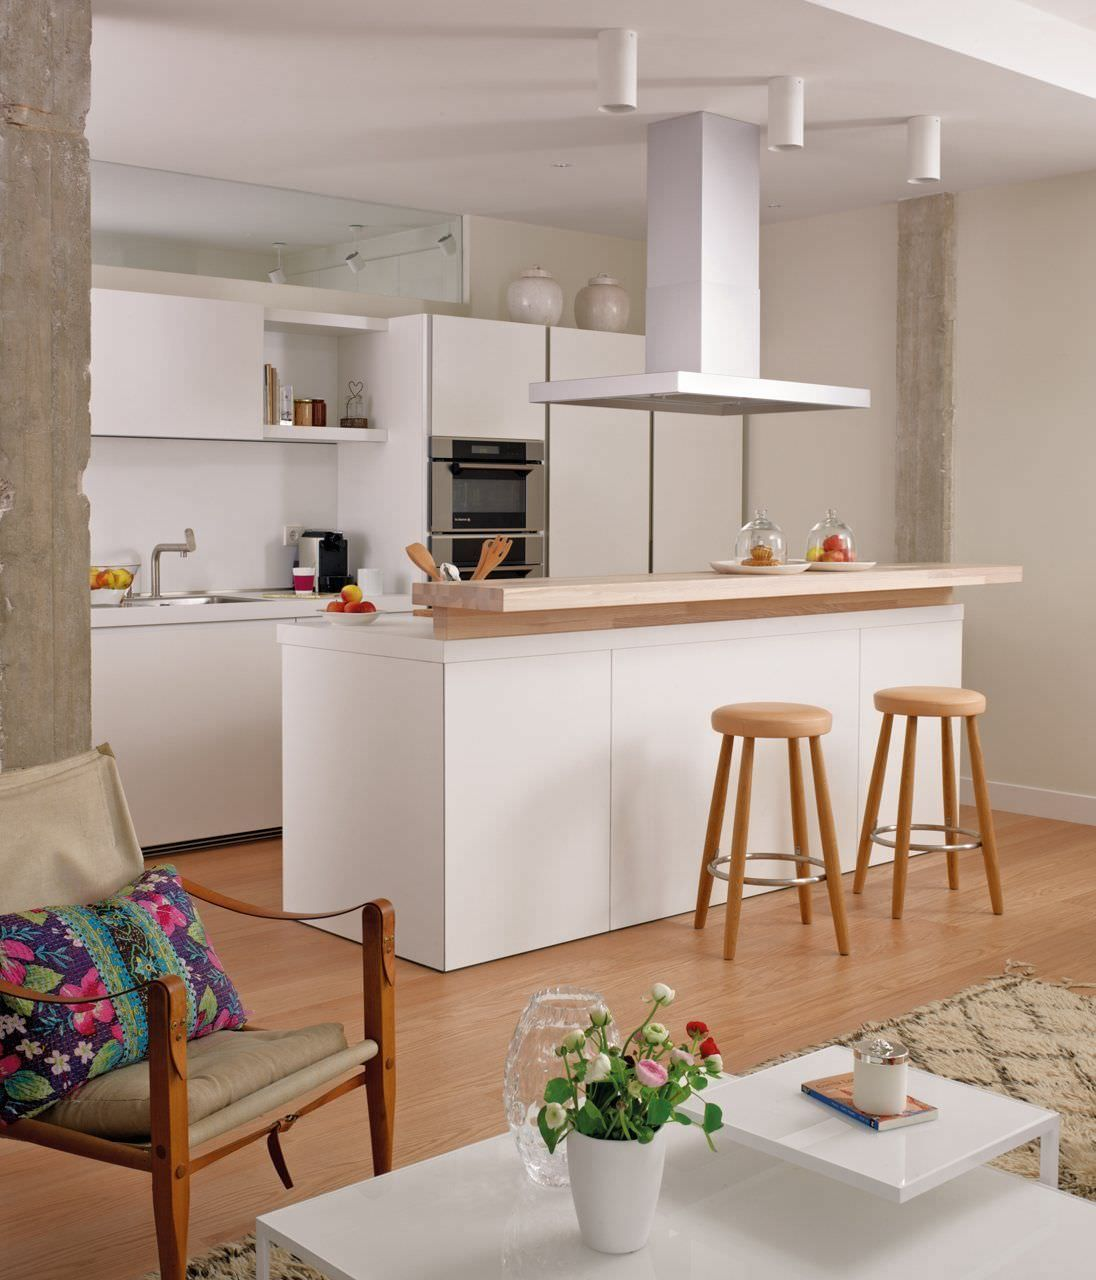 Open Space Cucine Moderne Con Isola Centrale.100 Idee Cucine Con Isola Moderne E Funzionali Cucina